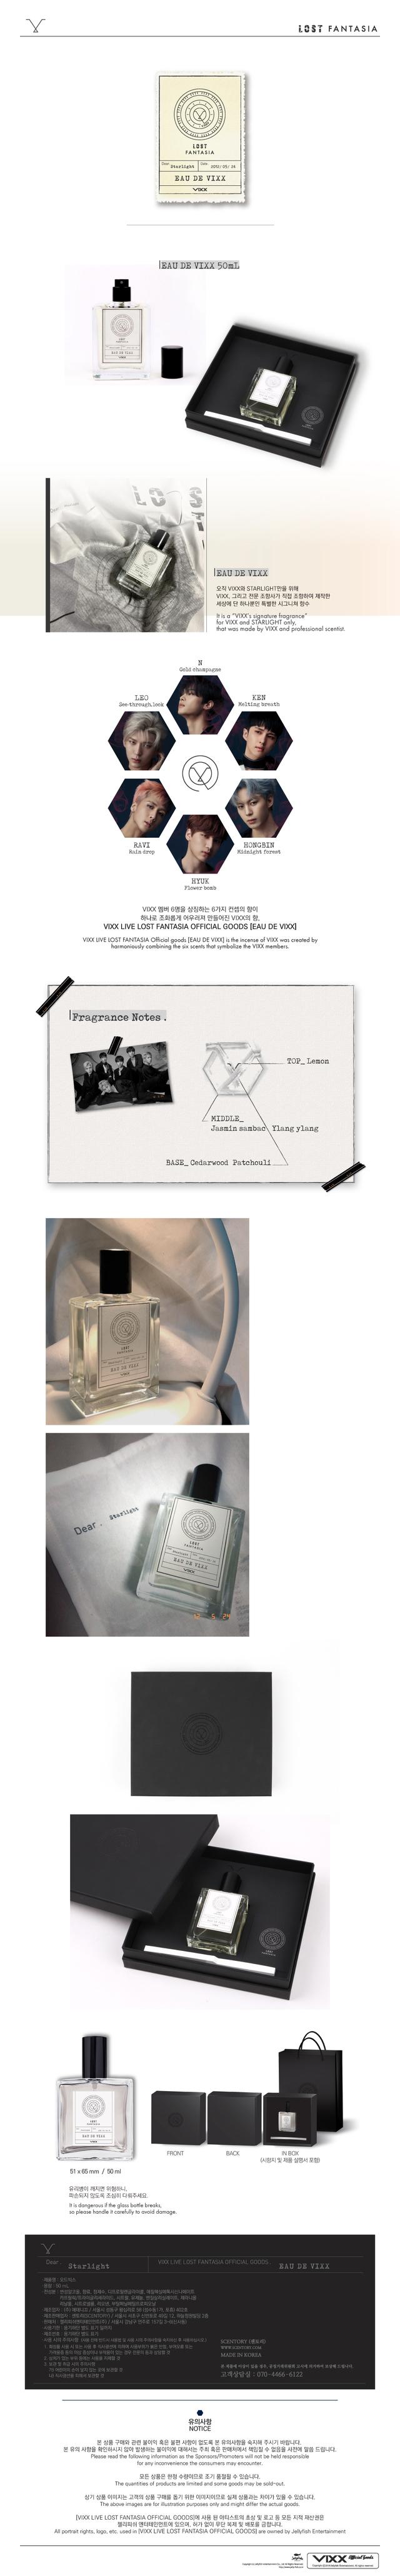 vixx_perfume.jpg